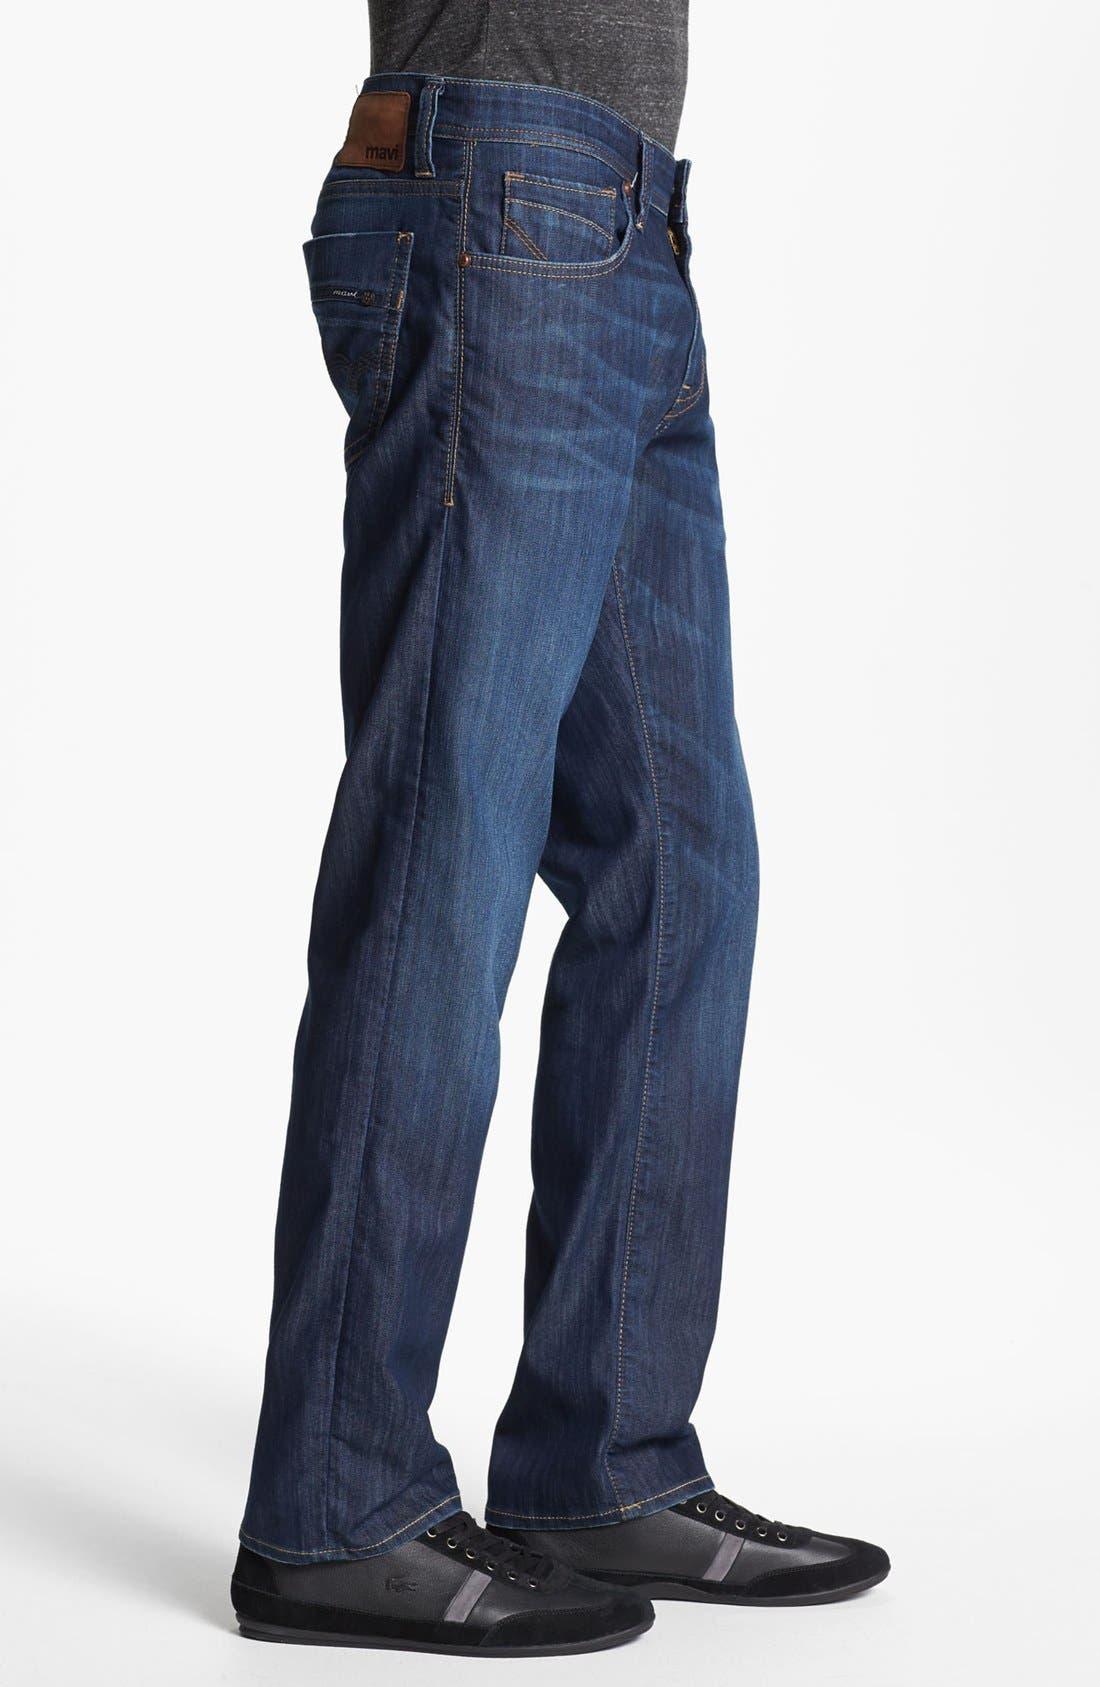 MAVI JEANS, Zach Straight Leg Jeans, Alternate thumbnail 8, color, DARK MAUI